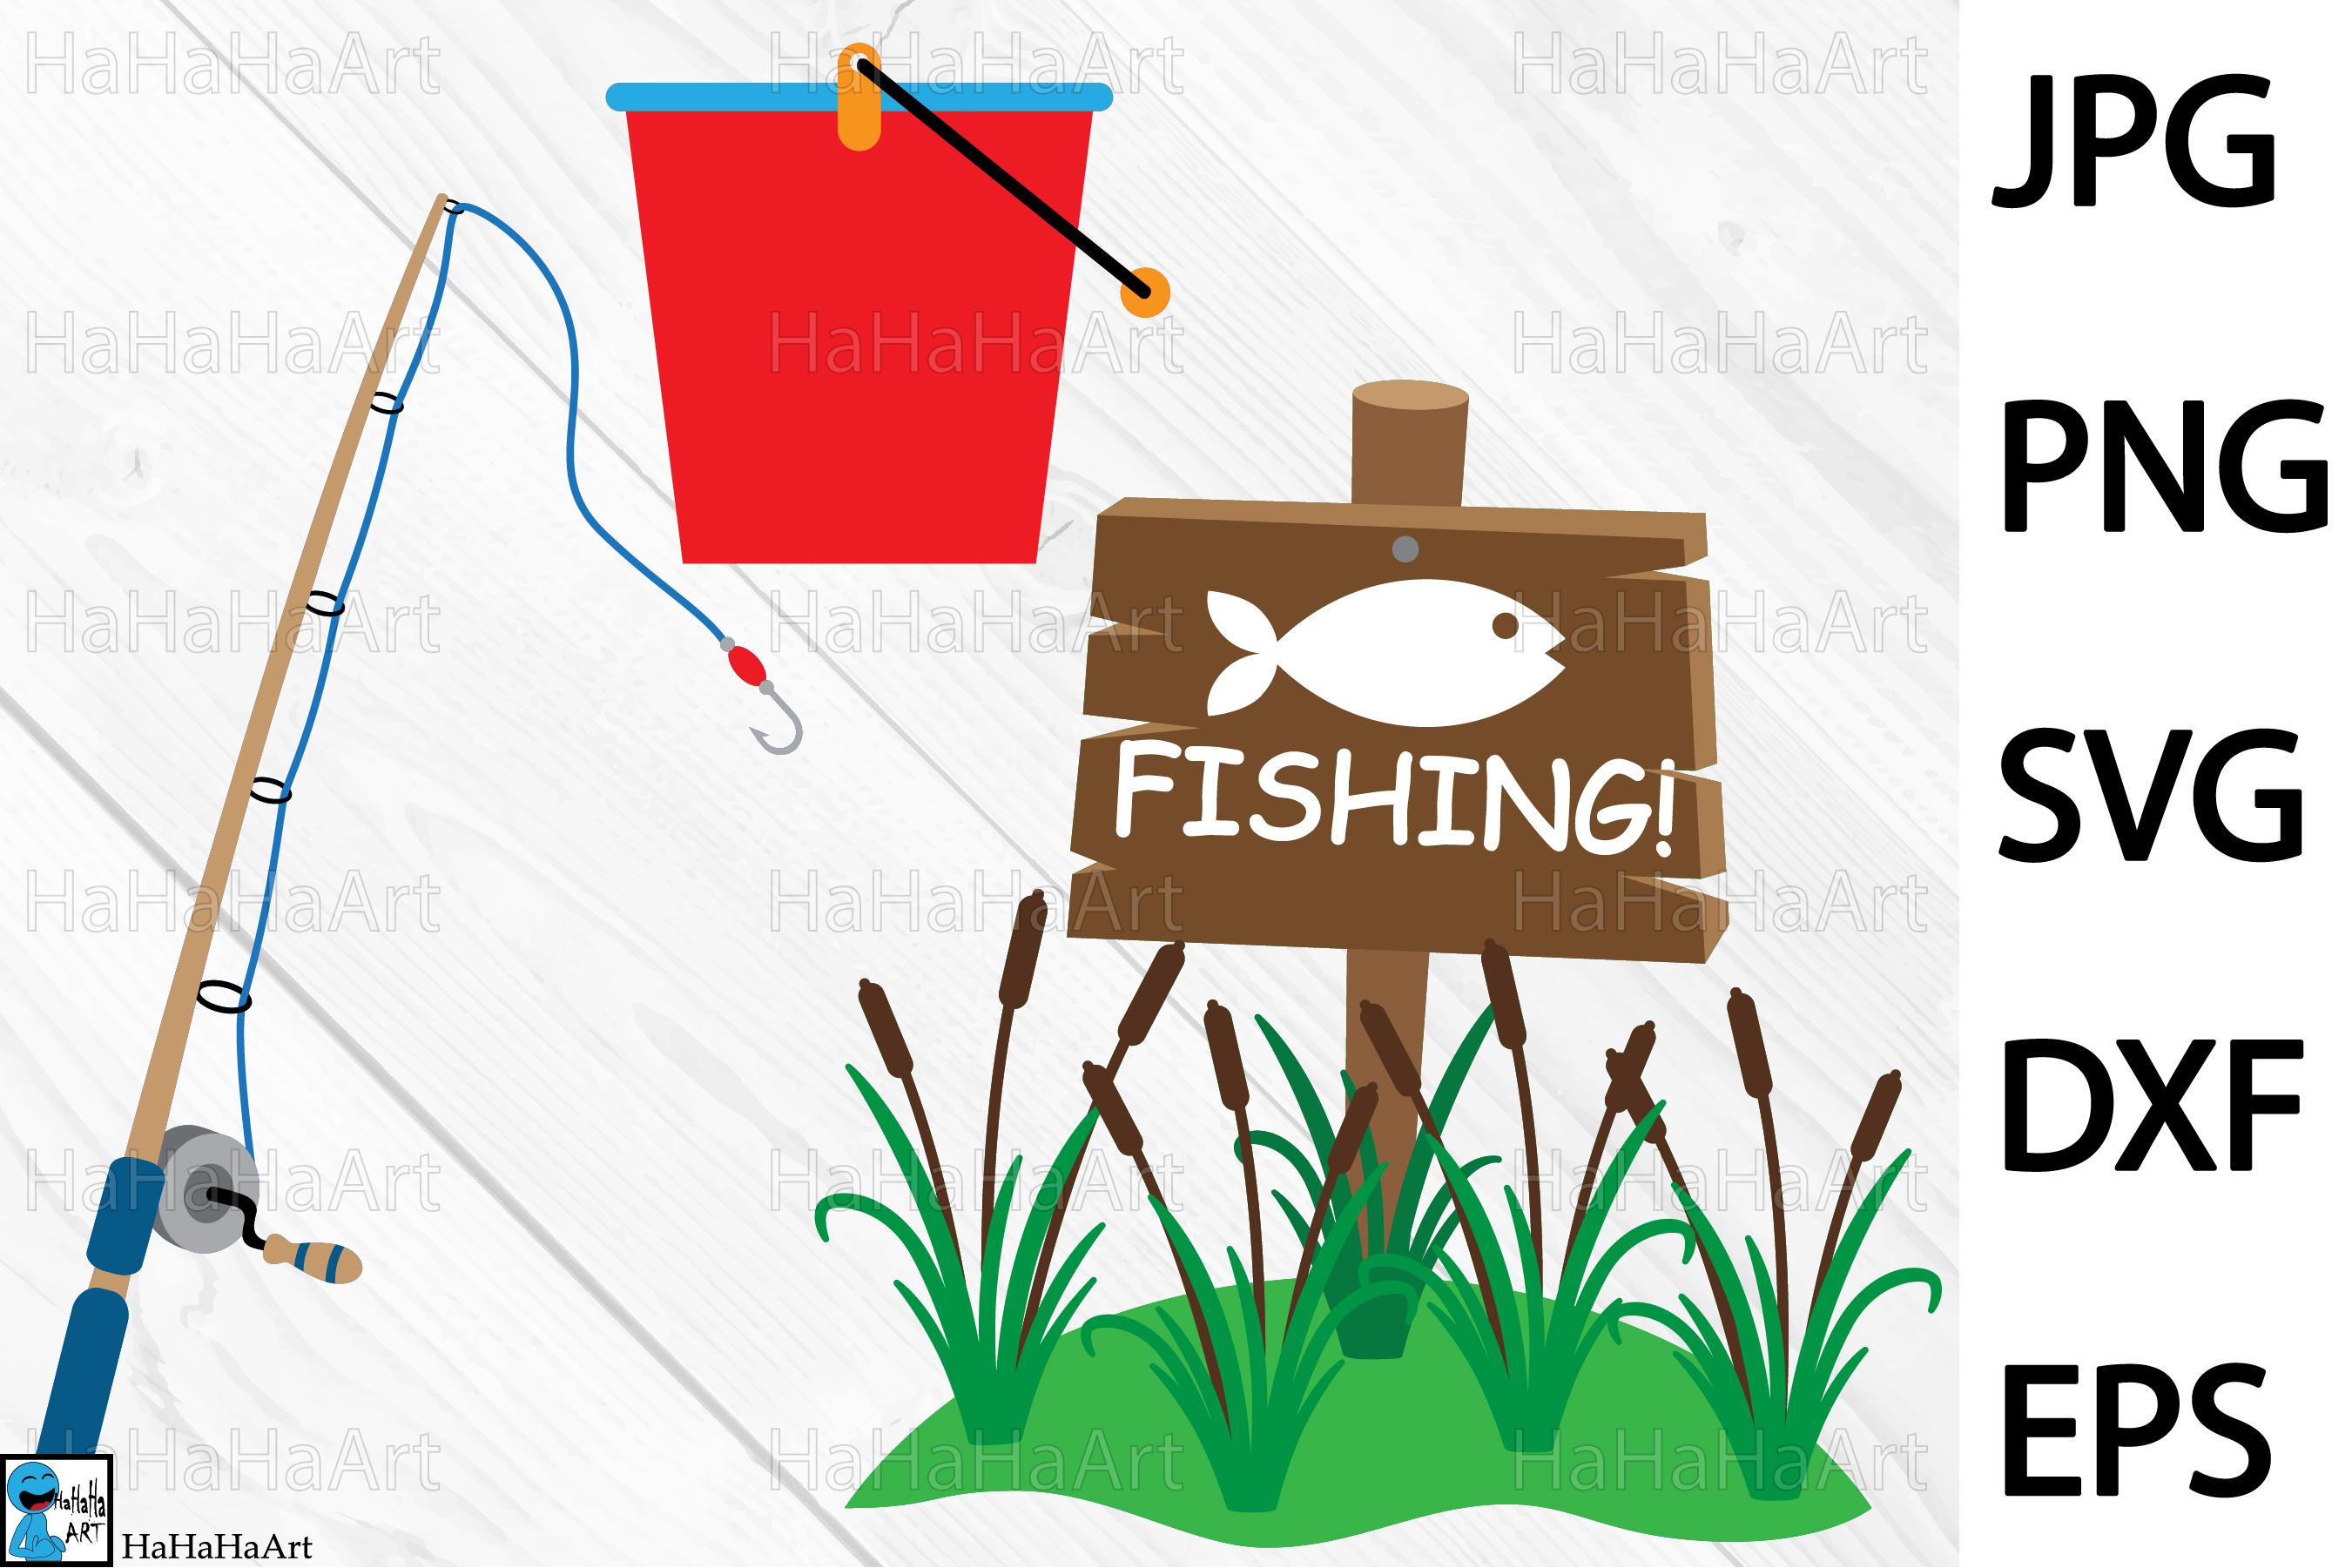 Fishing Designs - Clip art / Cutting Files 101c example image 2